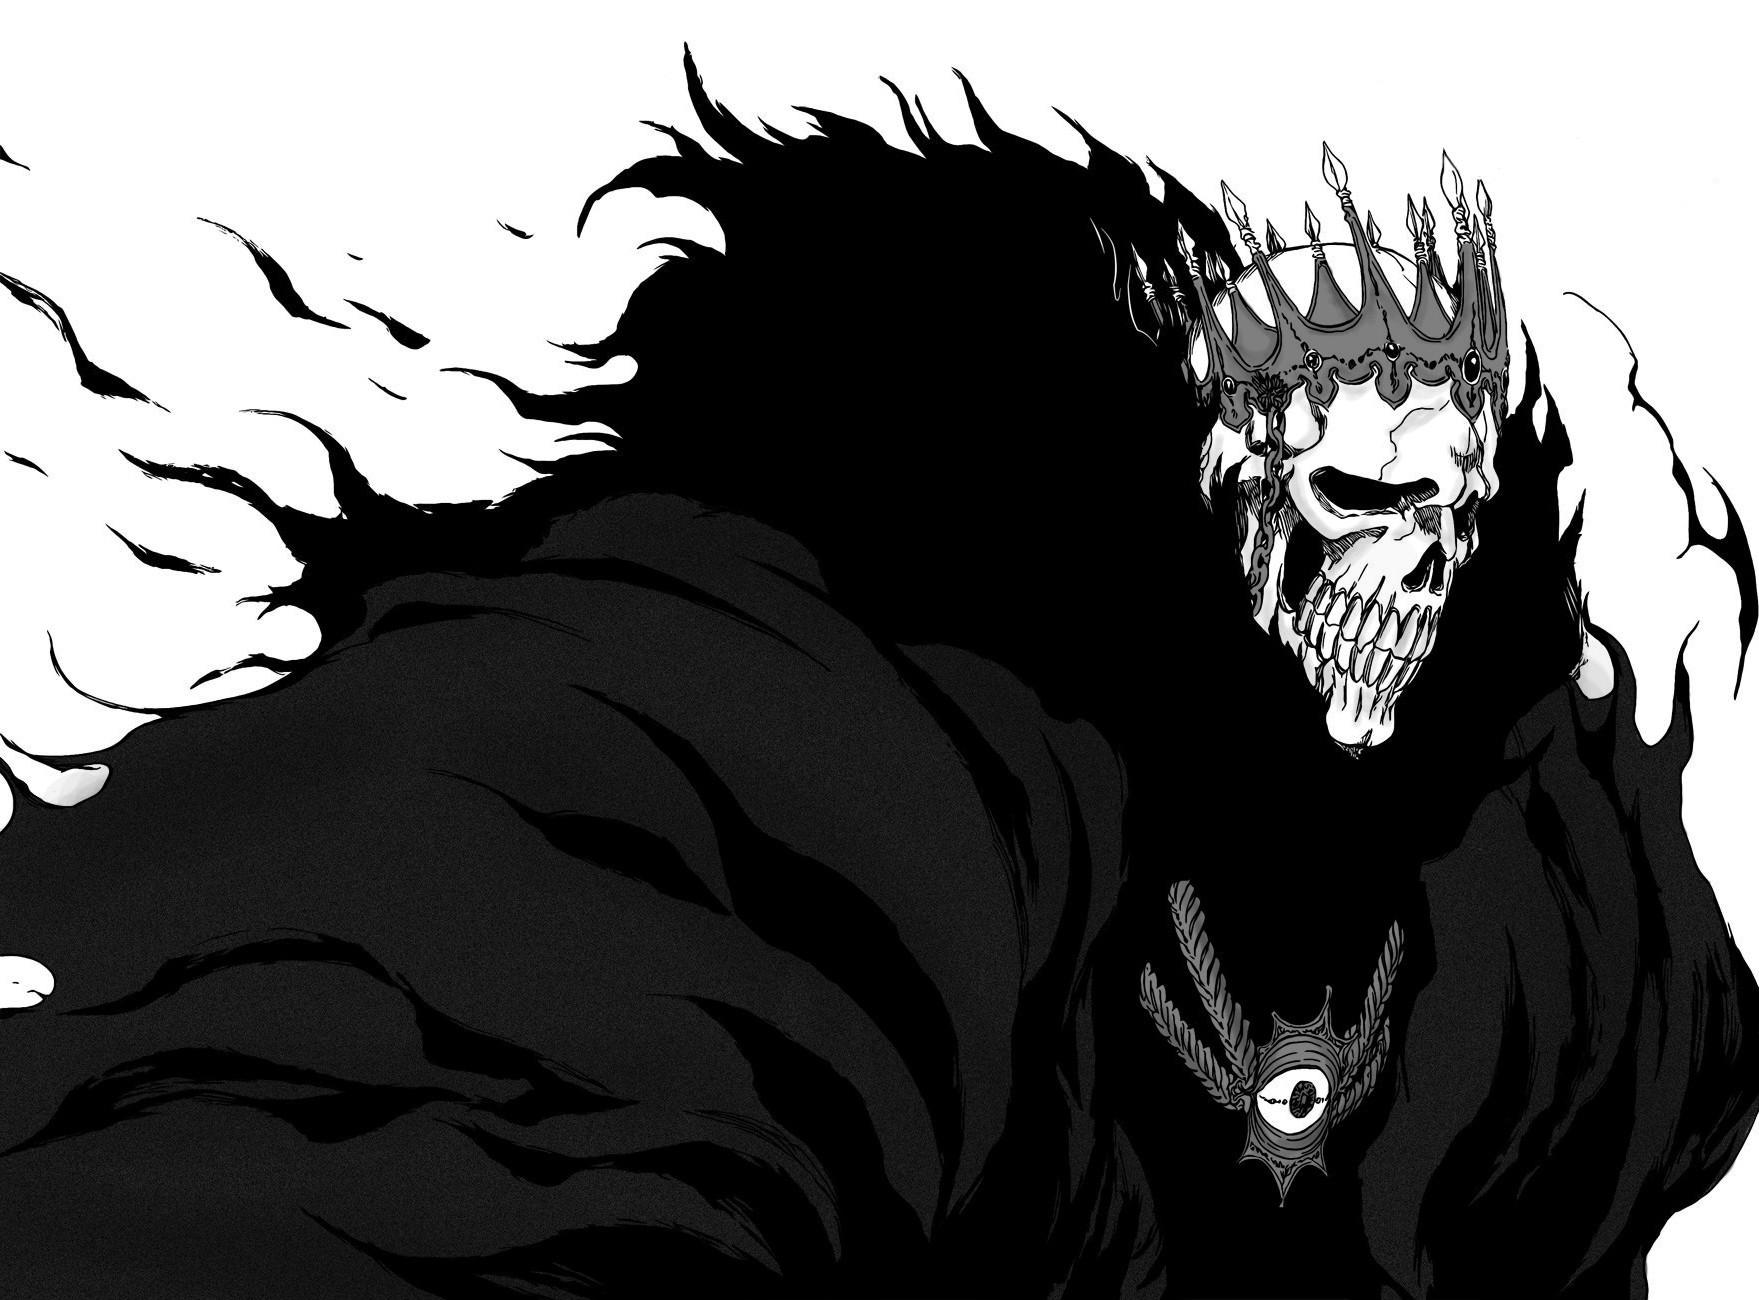 Drawing Illustration Monochrome Manga Cartoon Death Demon Bleach Espada Barragan Luisenbarn Sketch Black And White